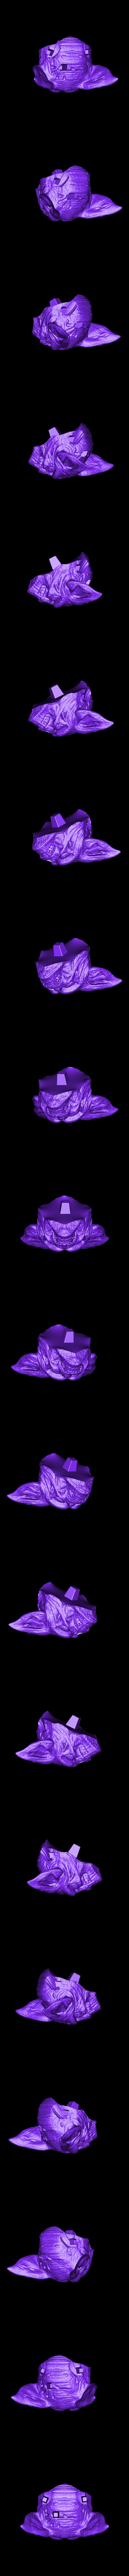 Skull-01.stl Download free STL file Batman 3d sculpture tested and ready for printing by B3DSERK Studios • 3D printer object, b3dserk